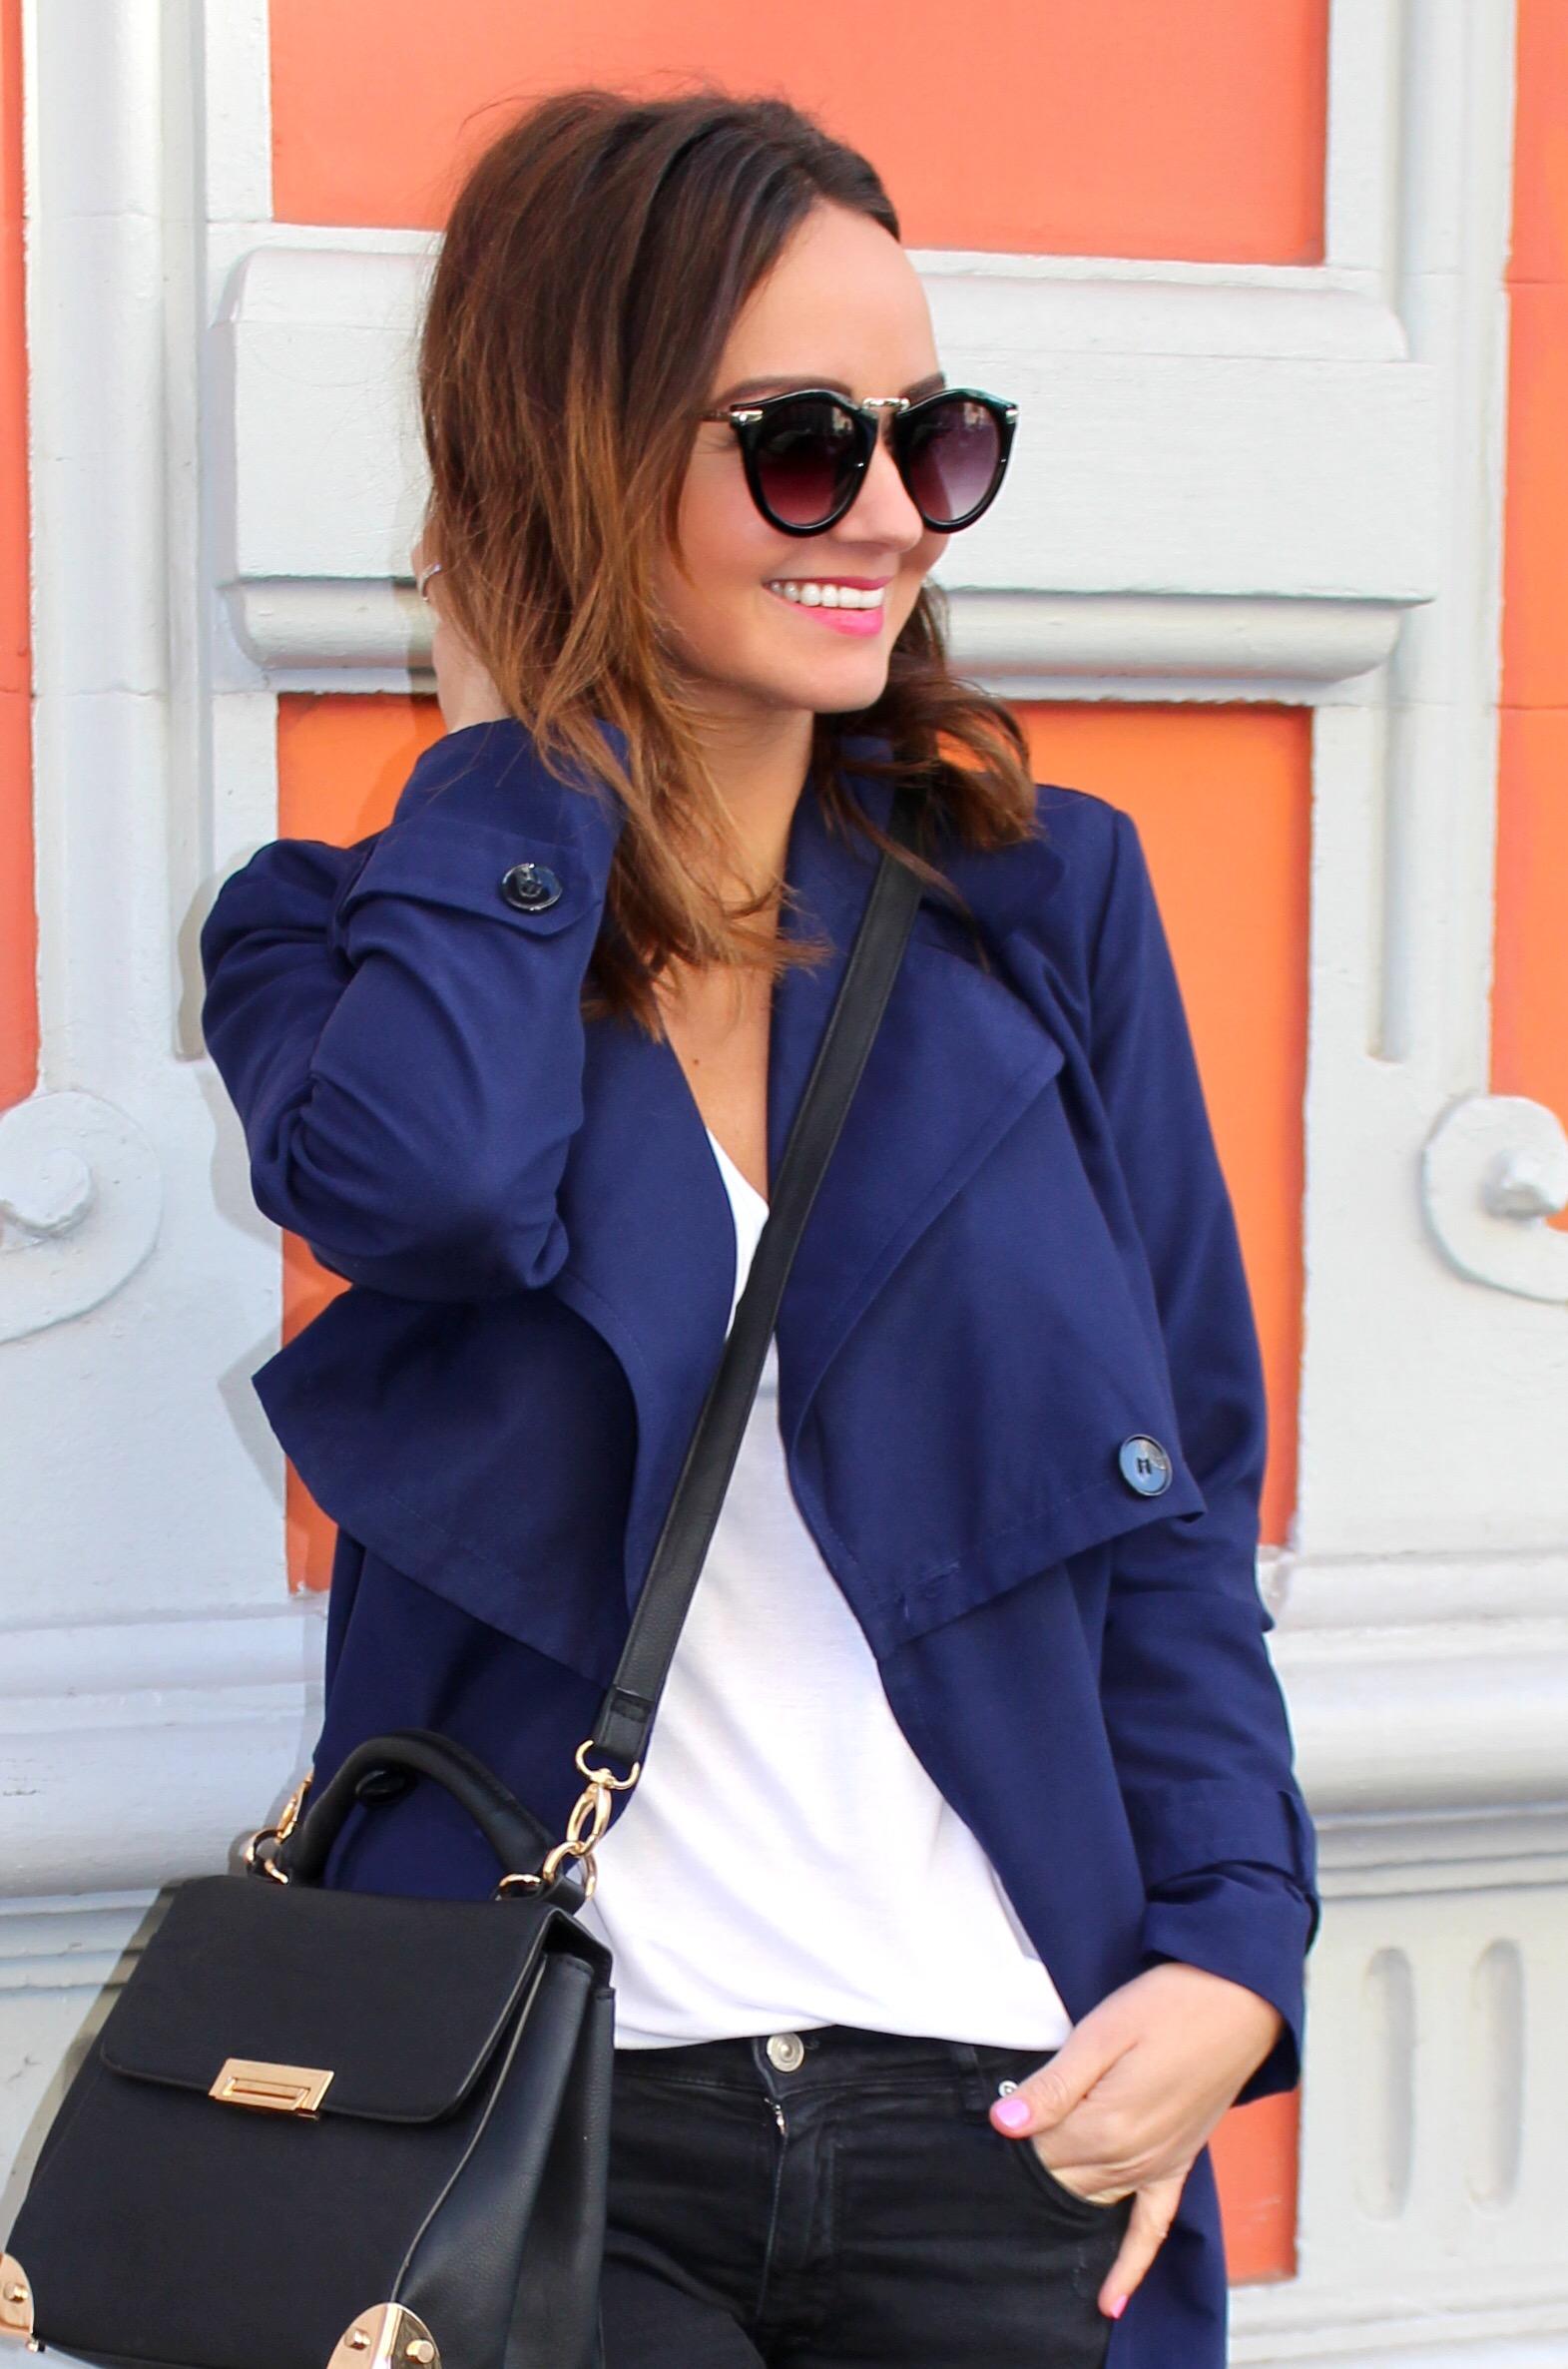 Fashioncircuz by Jenny img_1543 SHADES OF BLUE